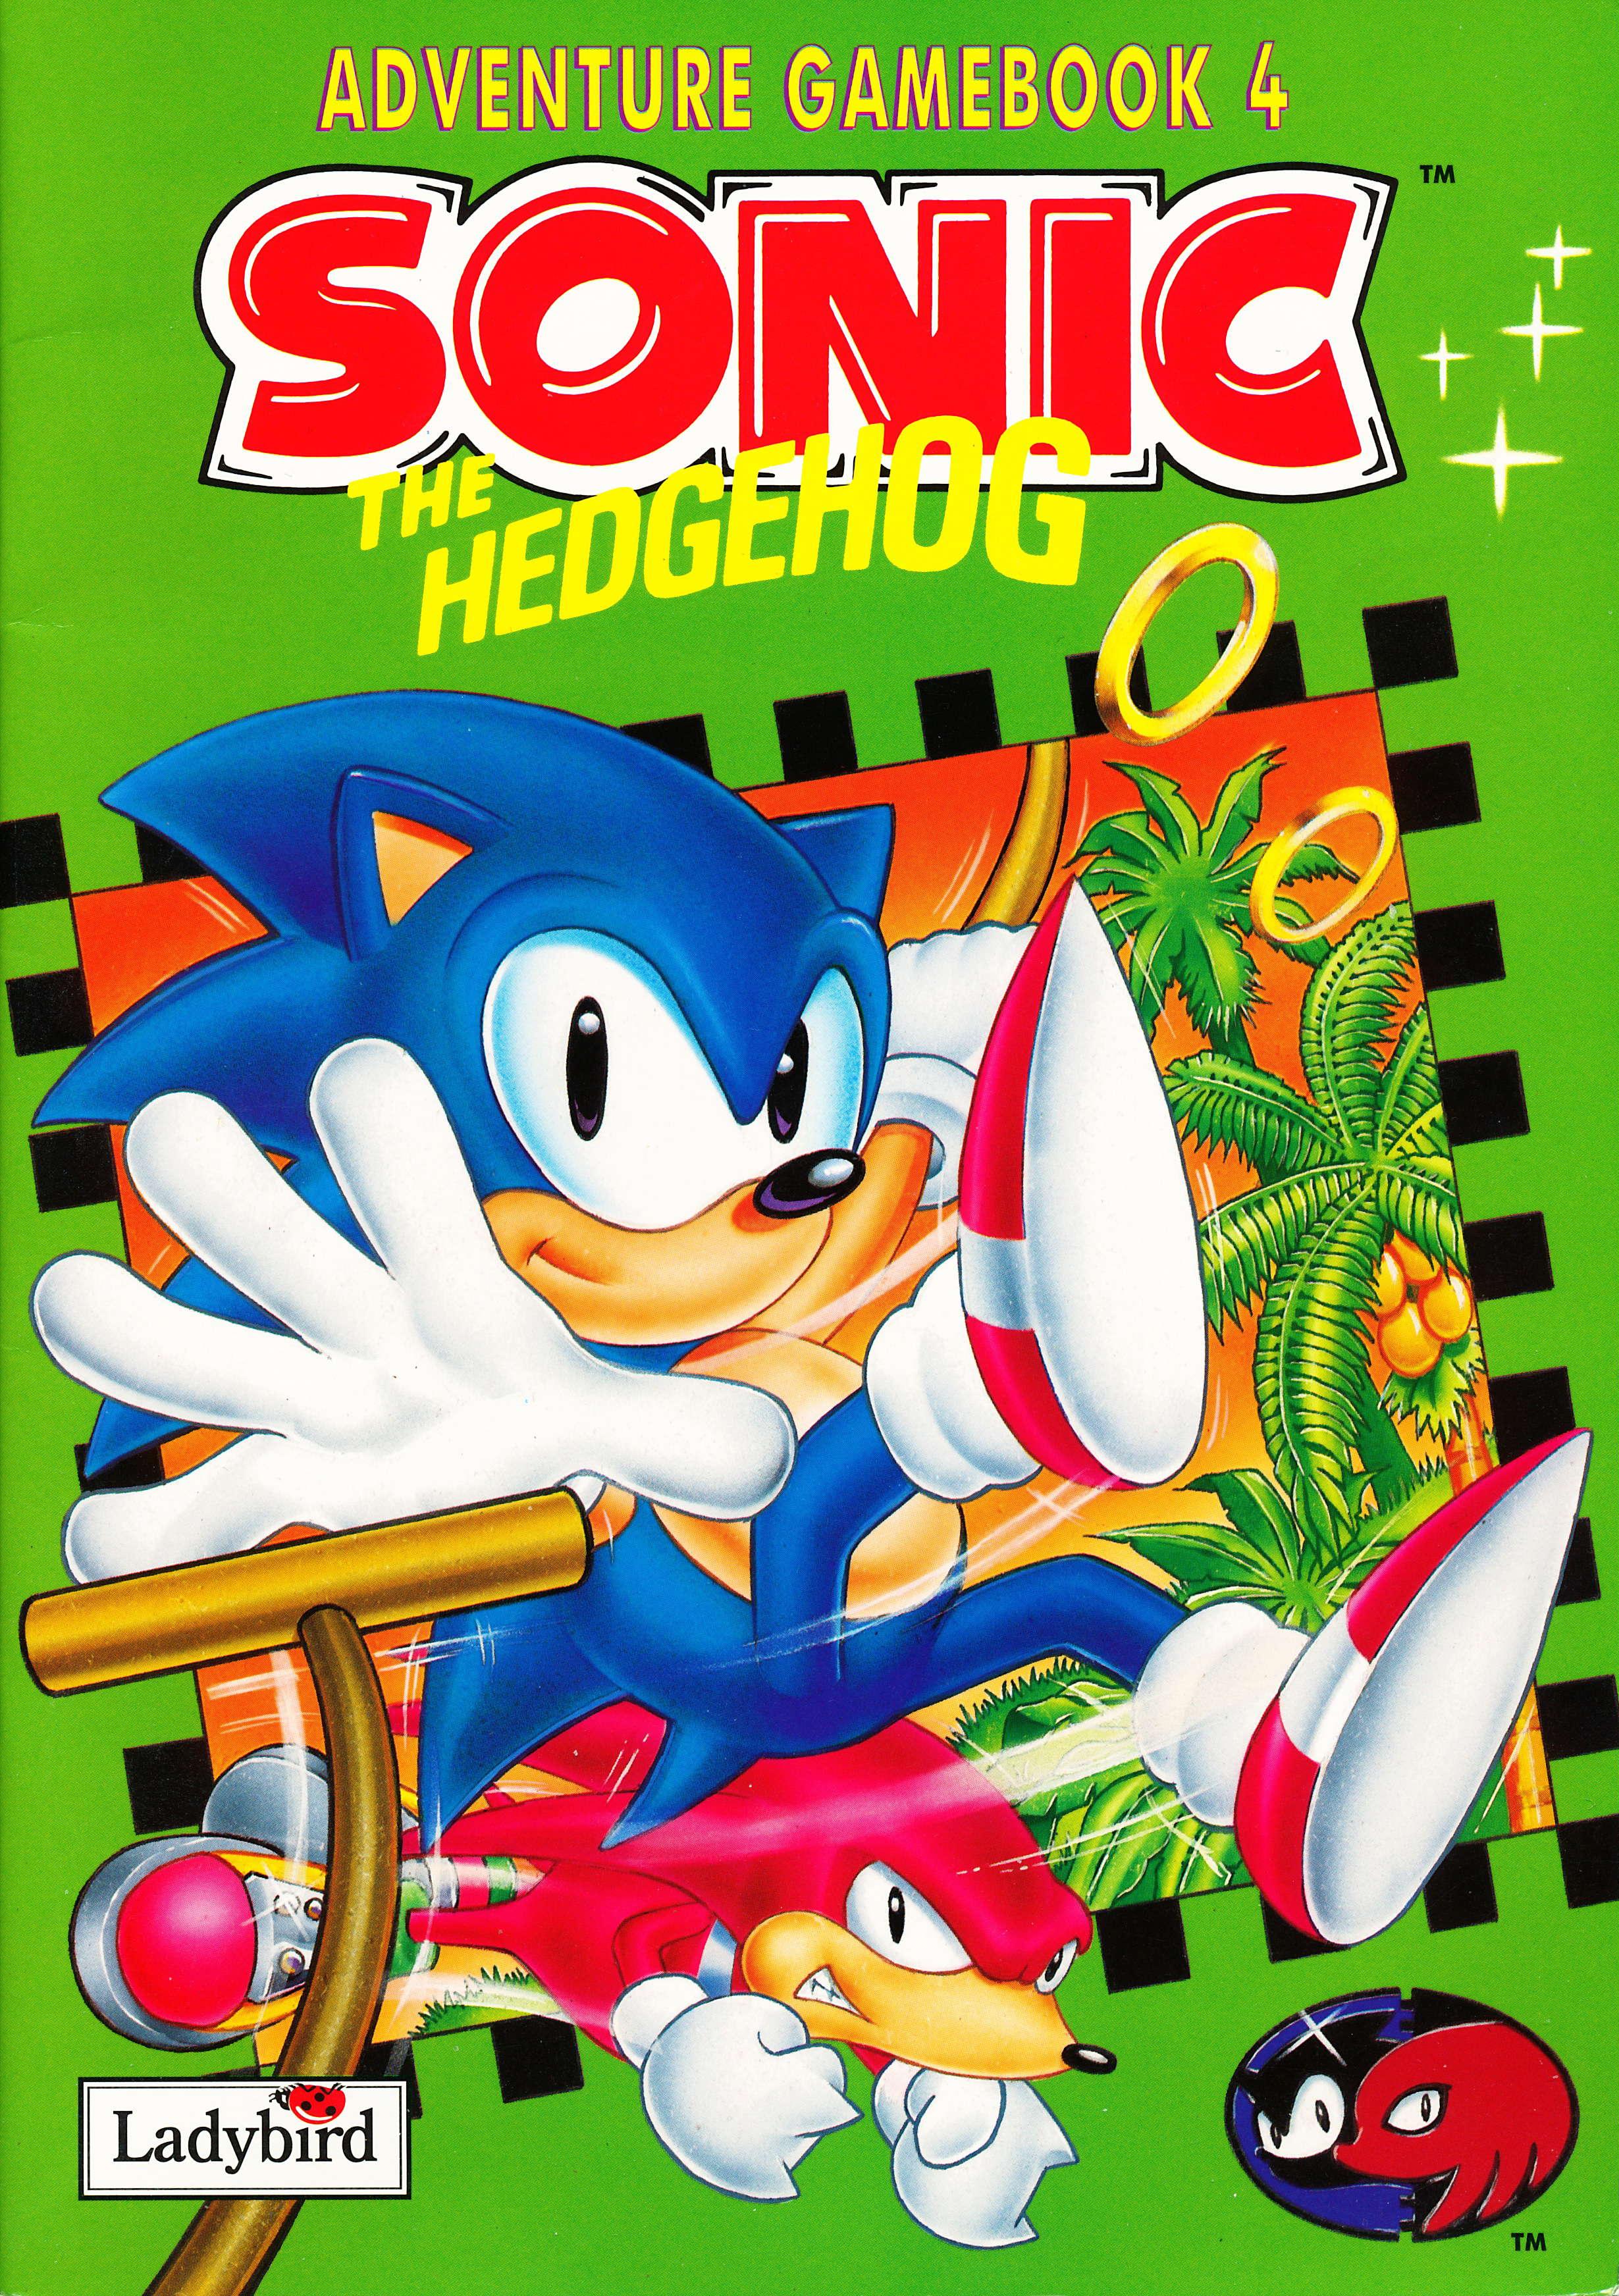 Sonic the Hedgehog Adventure Gamebook 4